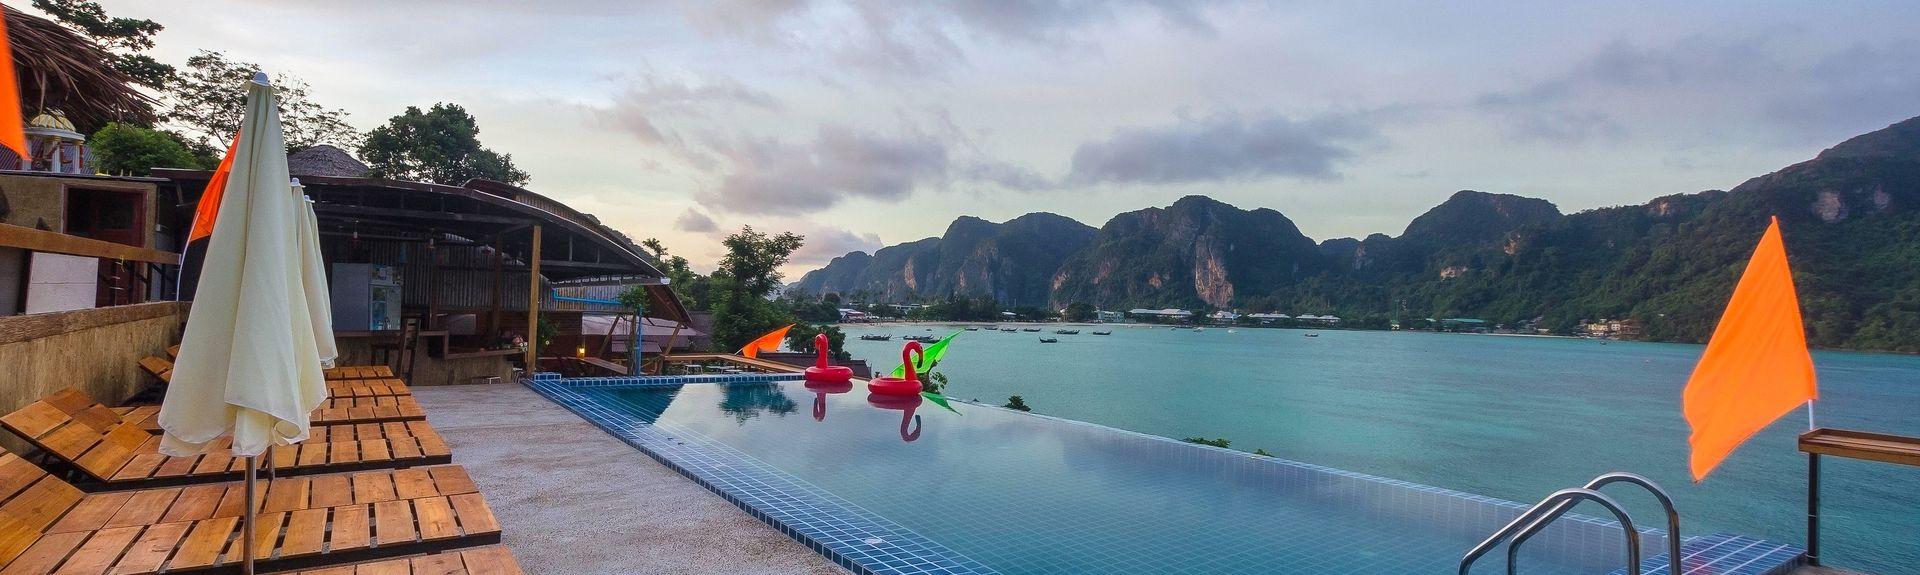 Ko Phi Phi Viewpoint, Krabi Province, Thailand